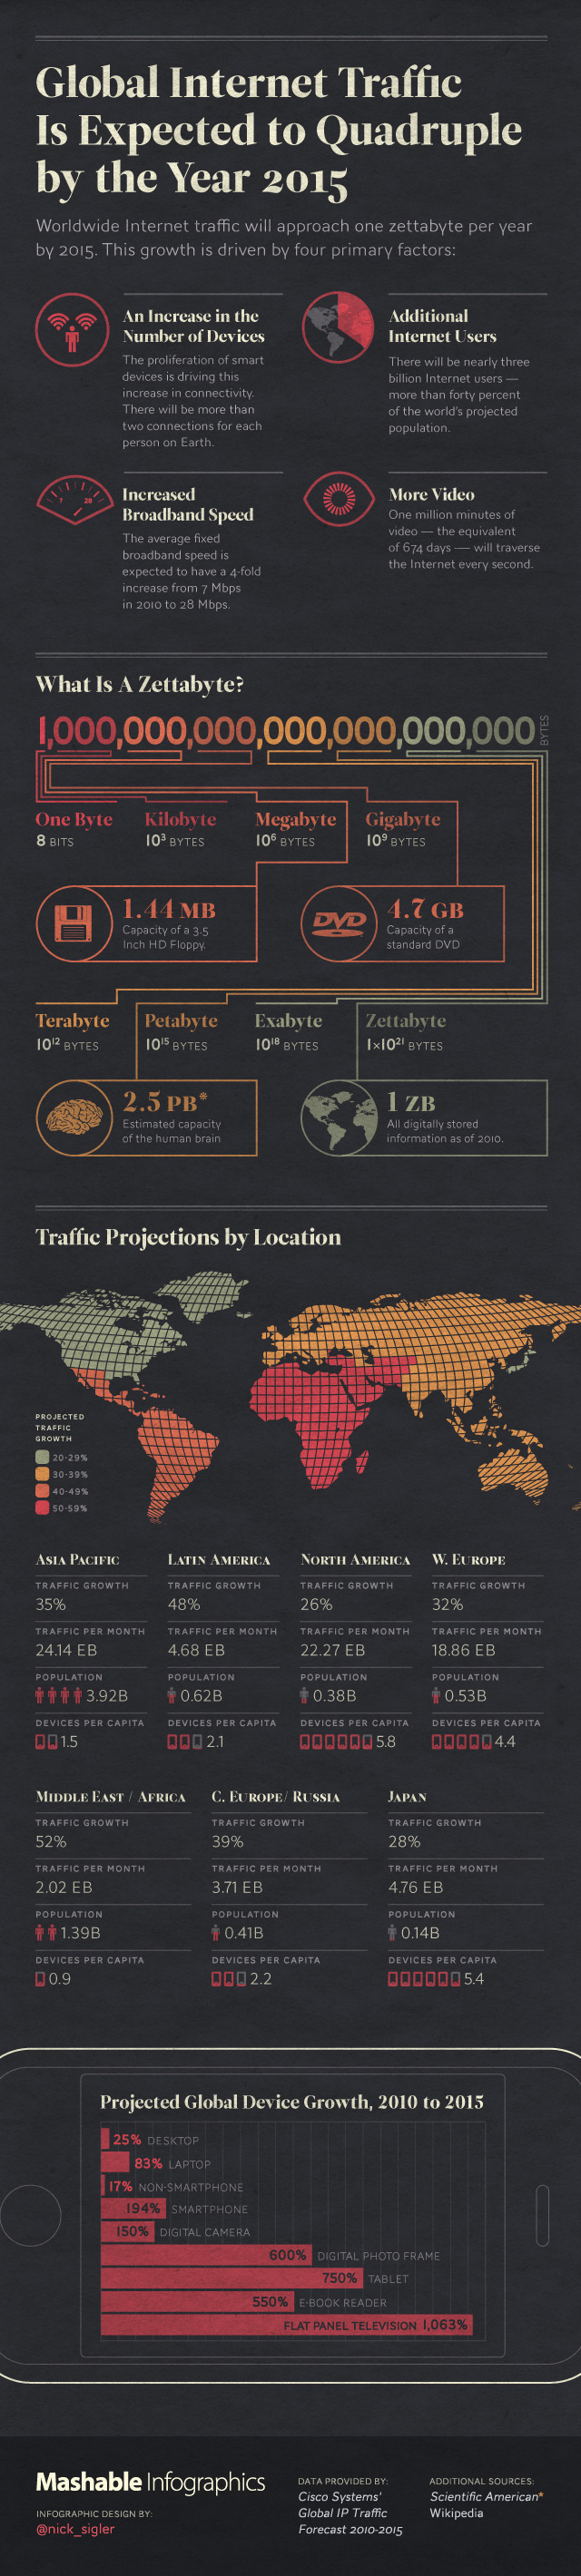 En 2015, le trafic Internet sera quadruplé